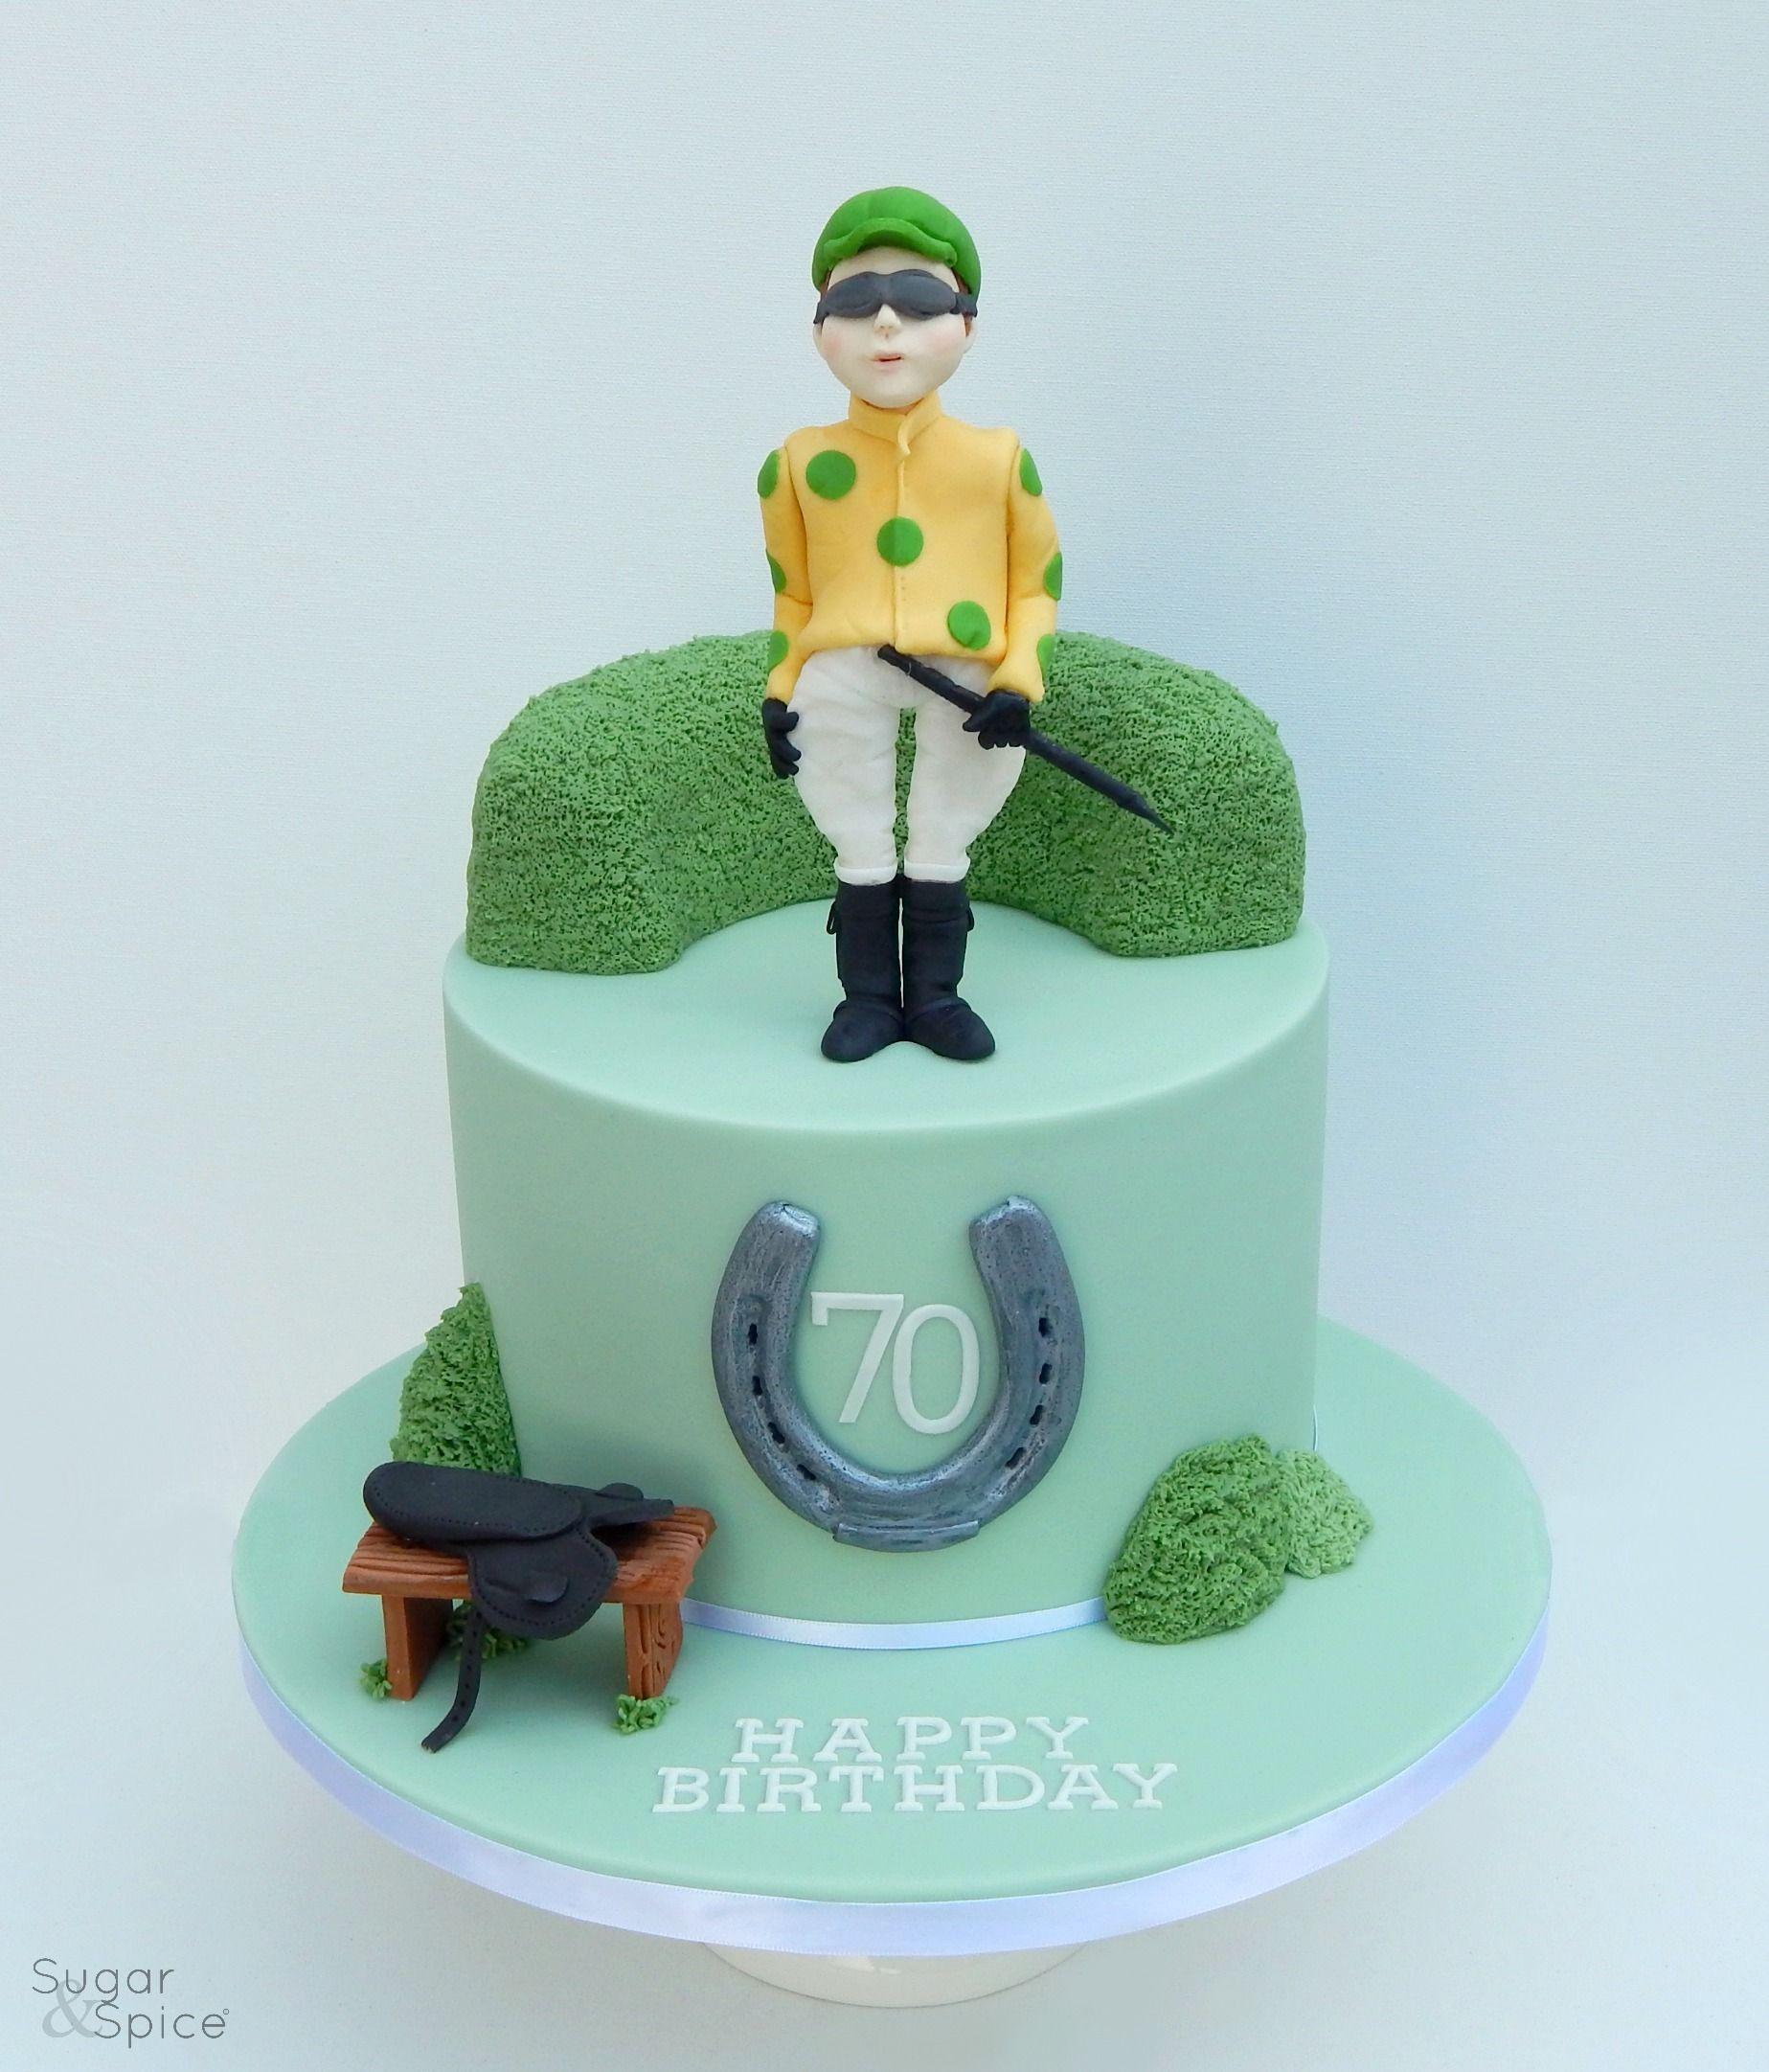 Jockey cake by Sugar & Spice Gourmandise Gifts Horse racing/jockey/racing saddle https://www.facebook.com/SugarandSpiceGourmandise